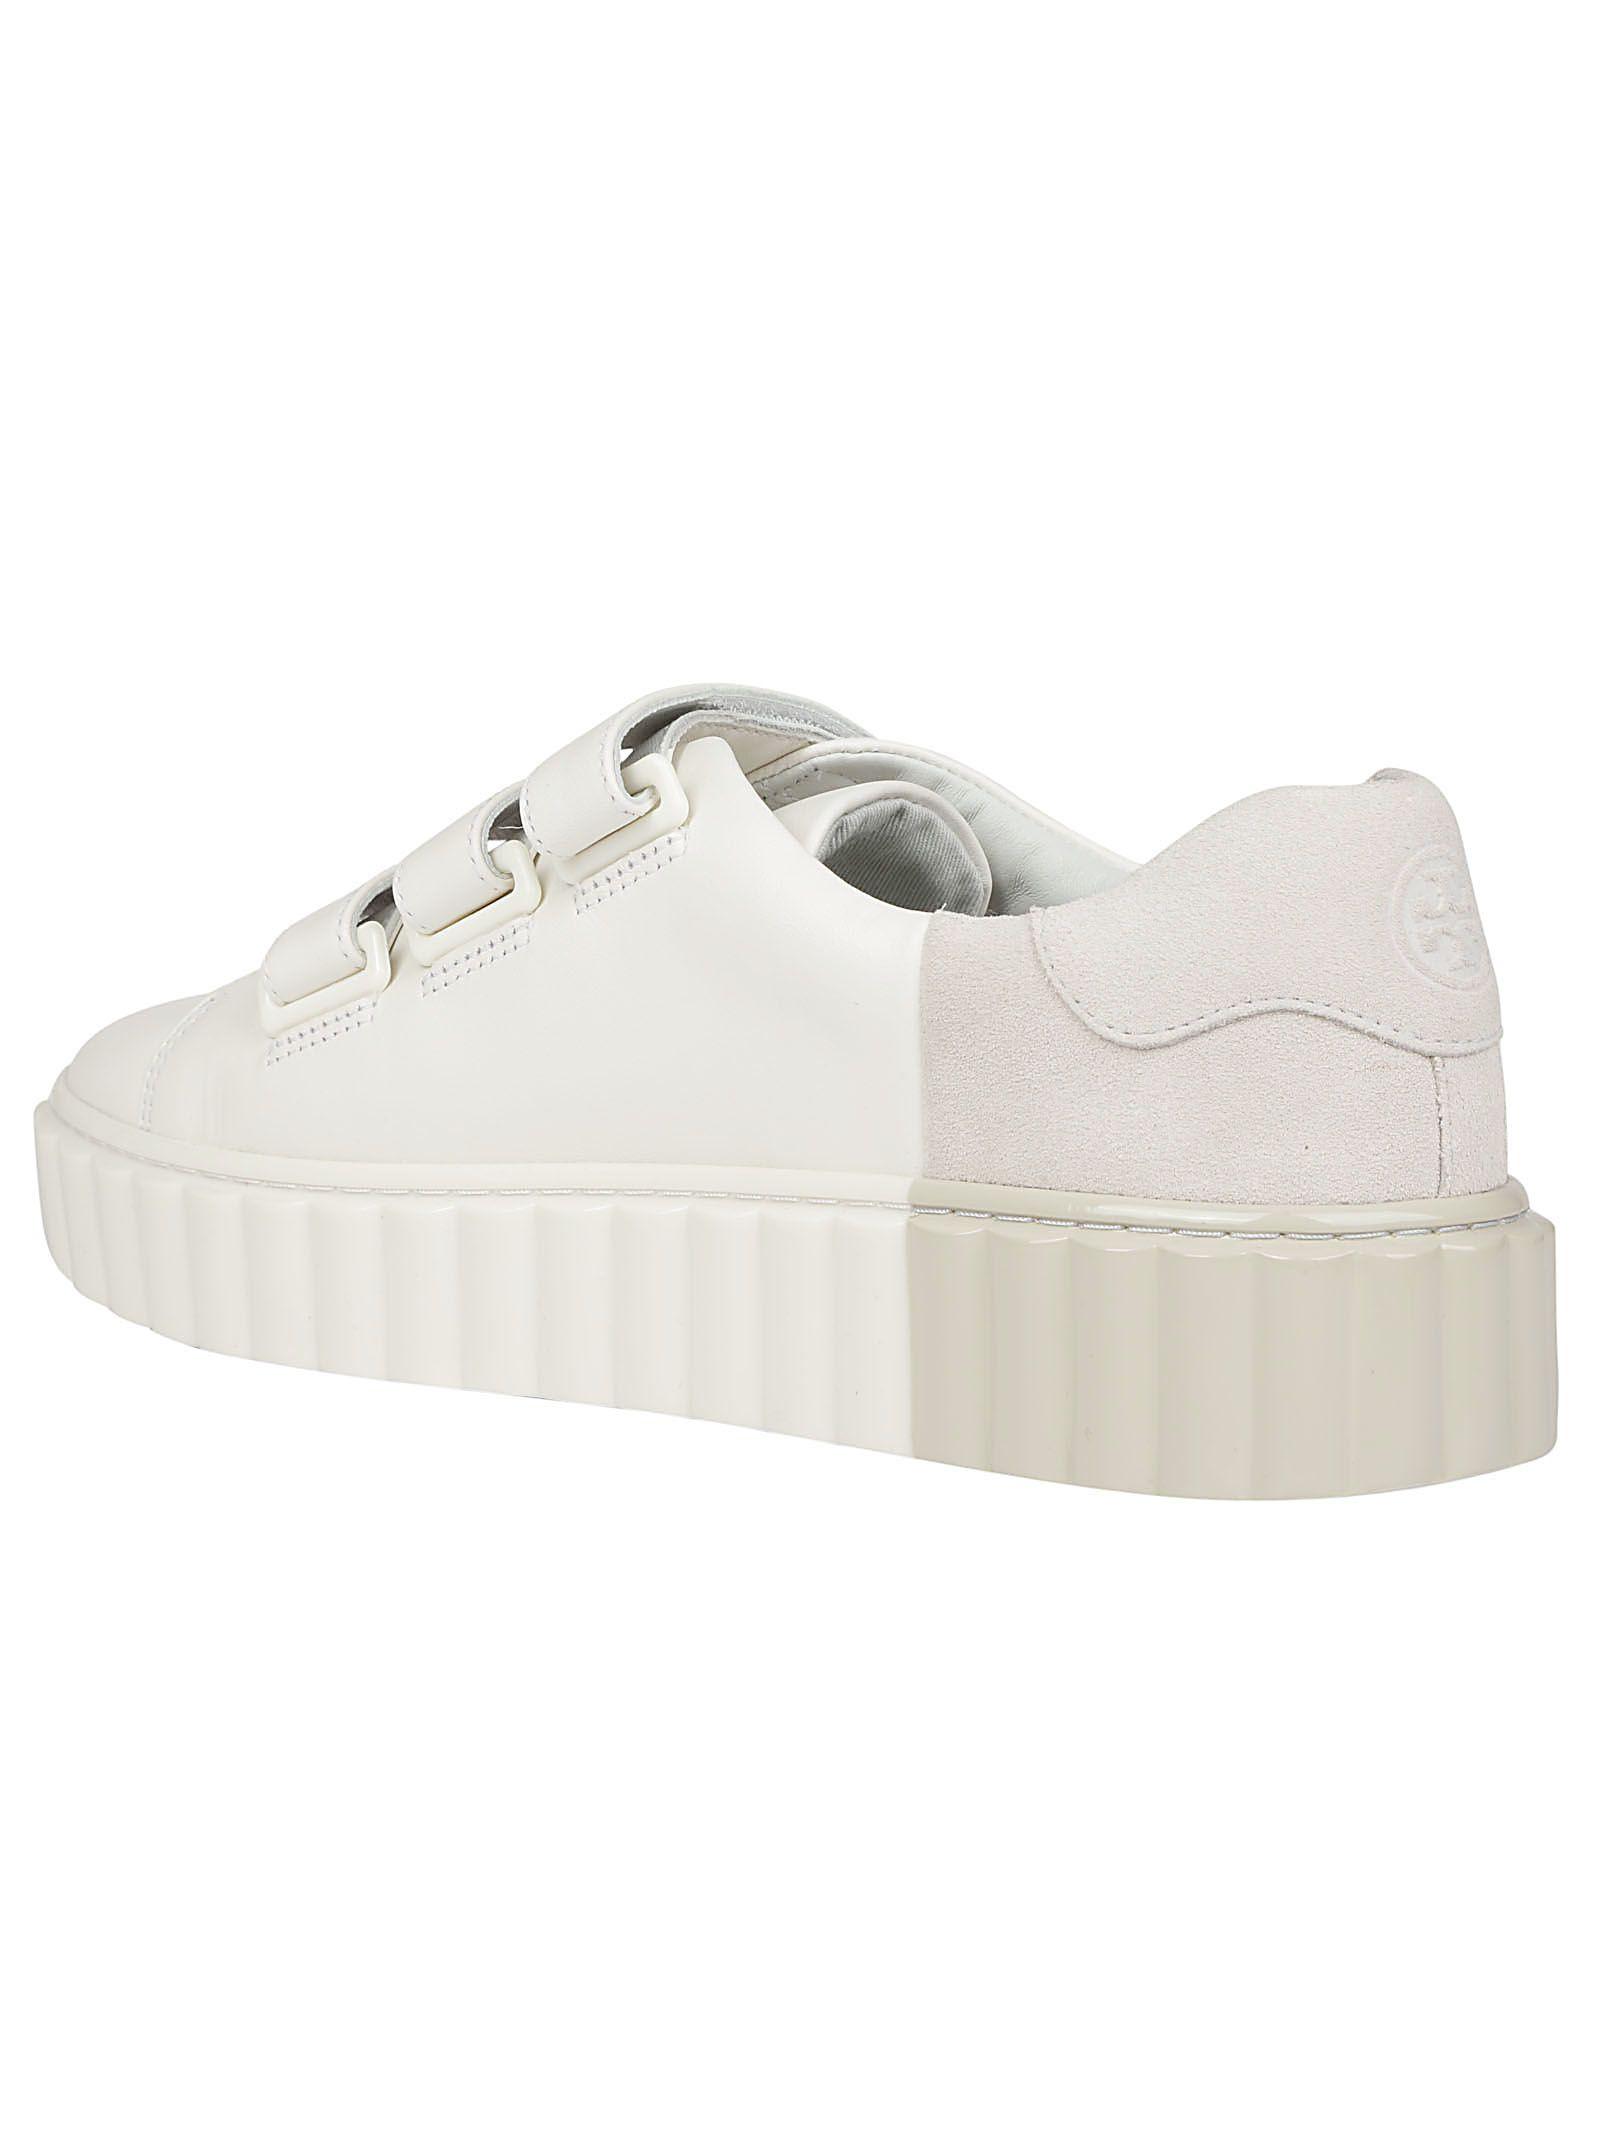 c6bfba3c3429 Tory Burch Tory Burch Scallop Triplestrap Sneakers - Basic ...